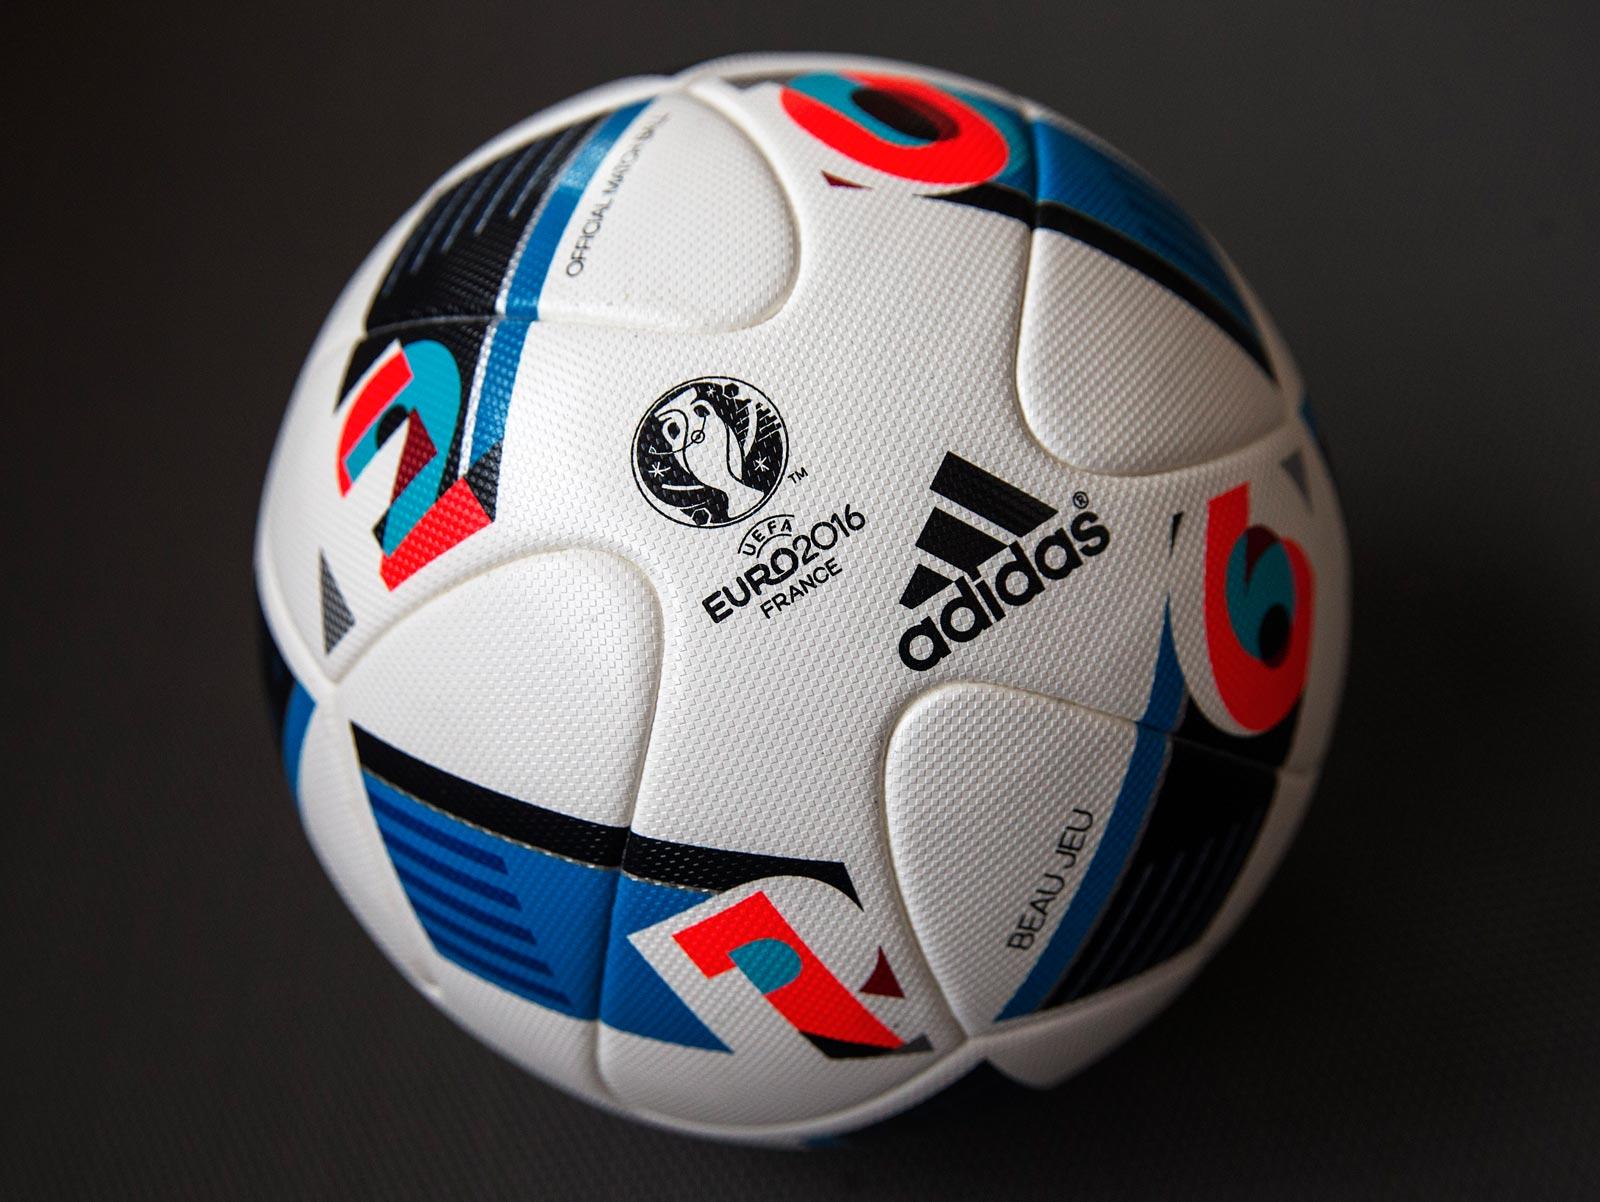 мяч спорт EURO 2016 adidas  № 3918534 без смс